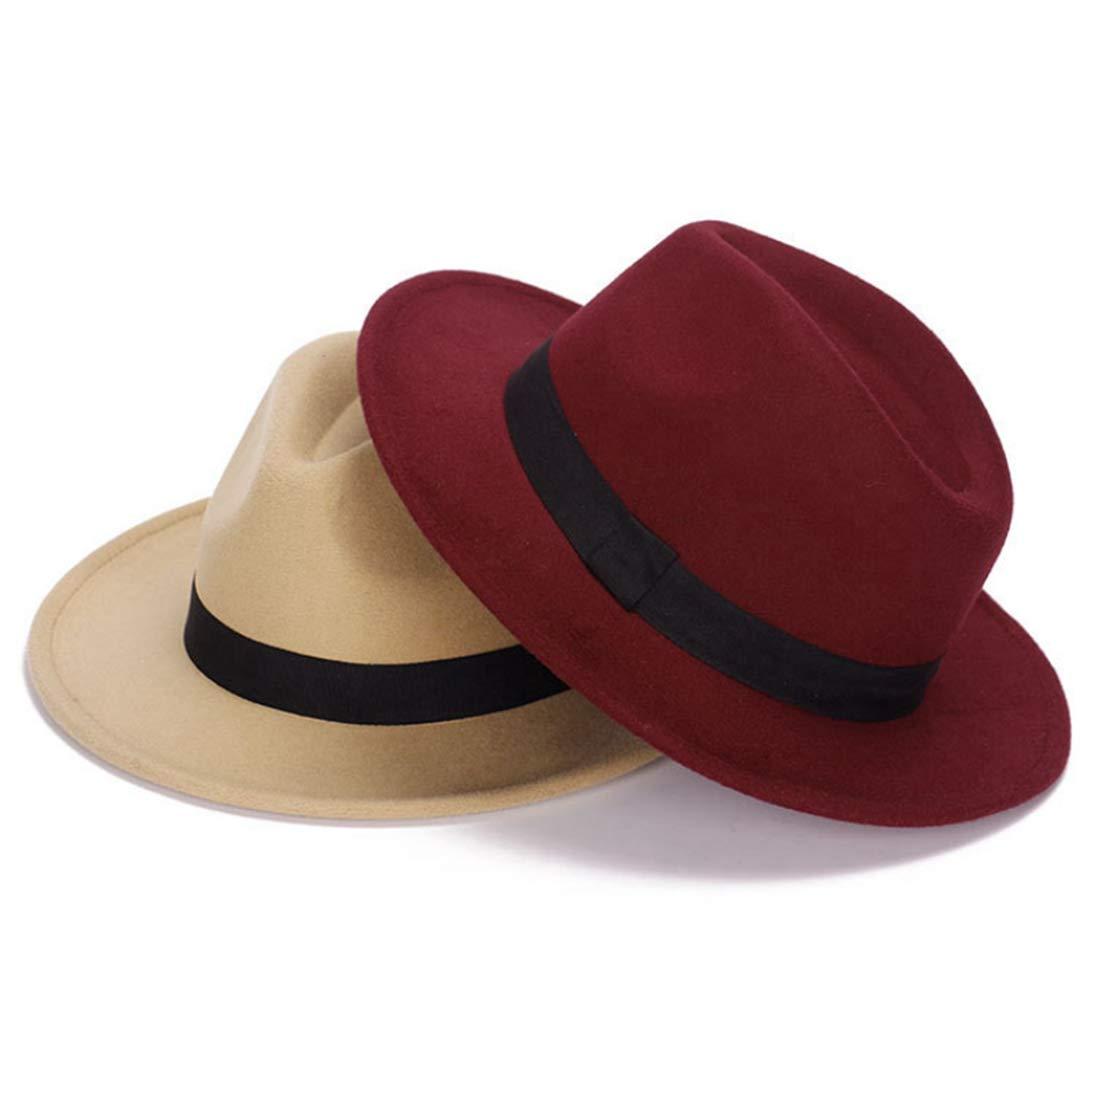 Mens Fedora Hats Unisex Classic Vintage Wide Brim Wool Felt Jazz Cap Gangster Hat with Black Band